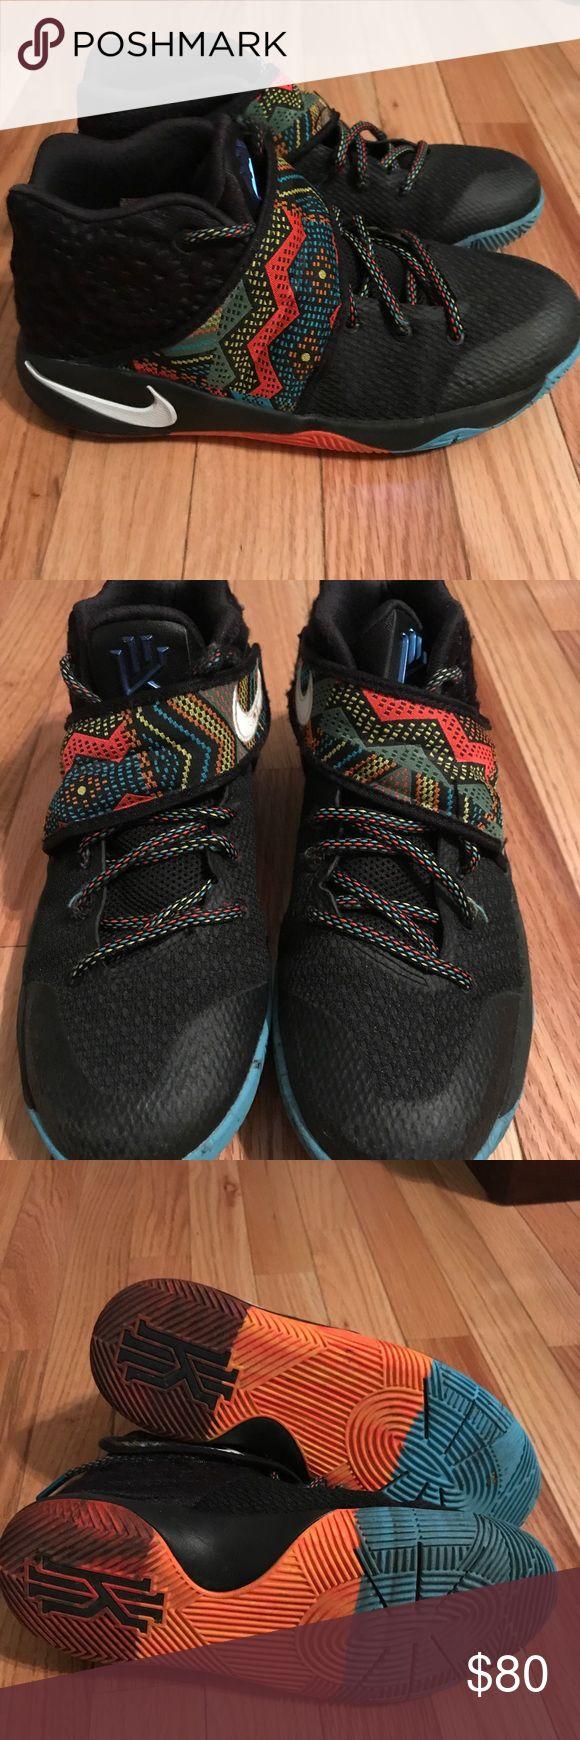 Kyrie Irving basketball Shoes Like new Kyrie Irving basketball shoes. Size 6.5 Youth. Literally worn twice. Kyrie Irving Shoes Athletic Shoes